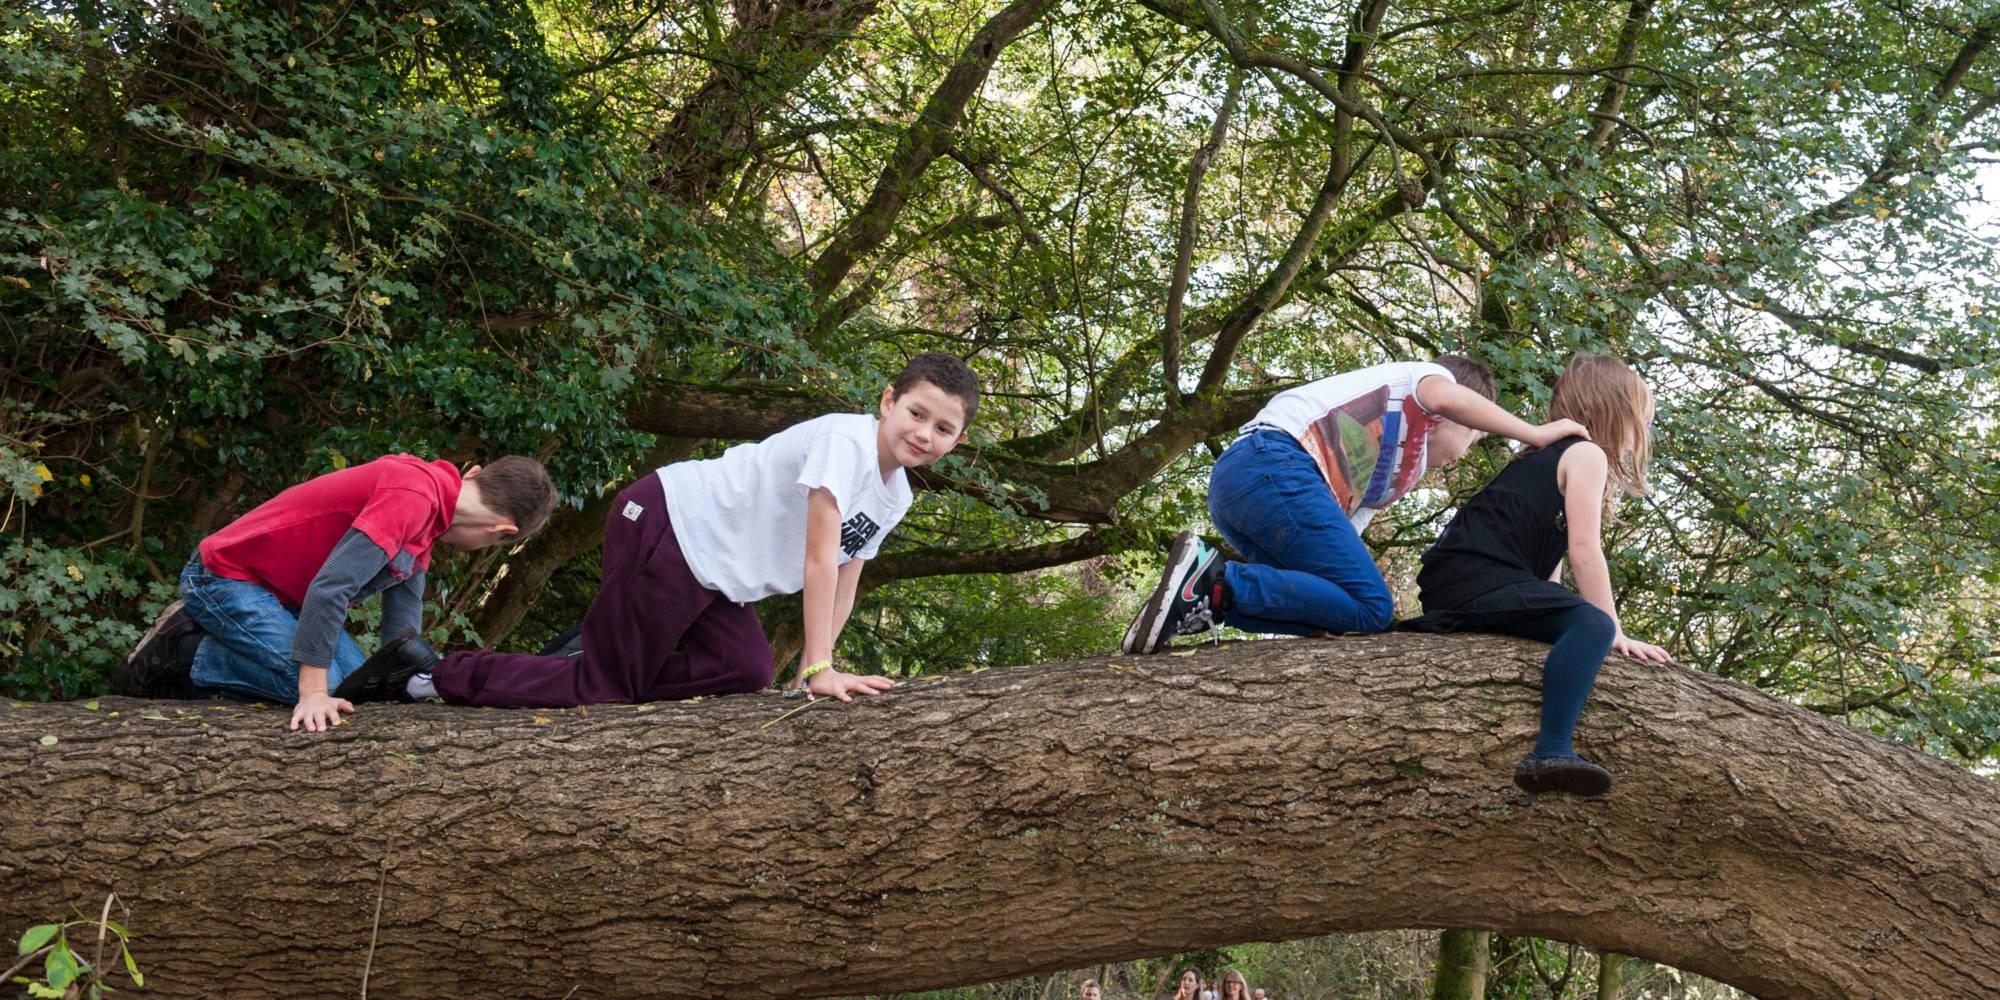 Children climbing Waddesdon trees on an autumn day